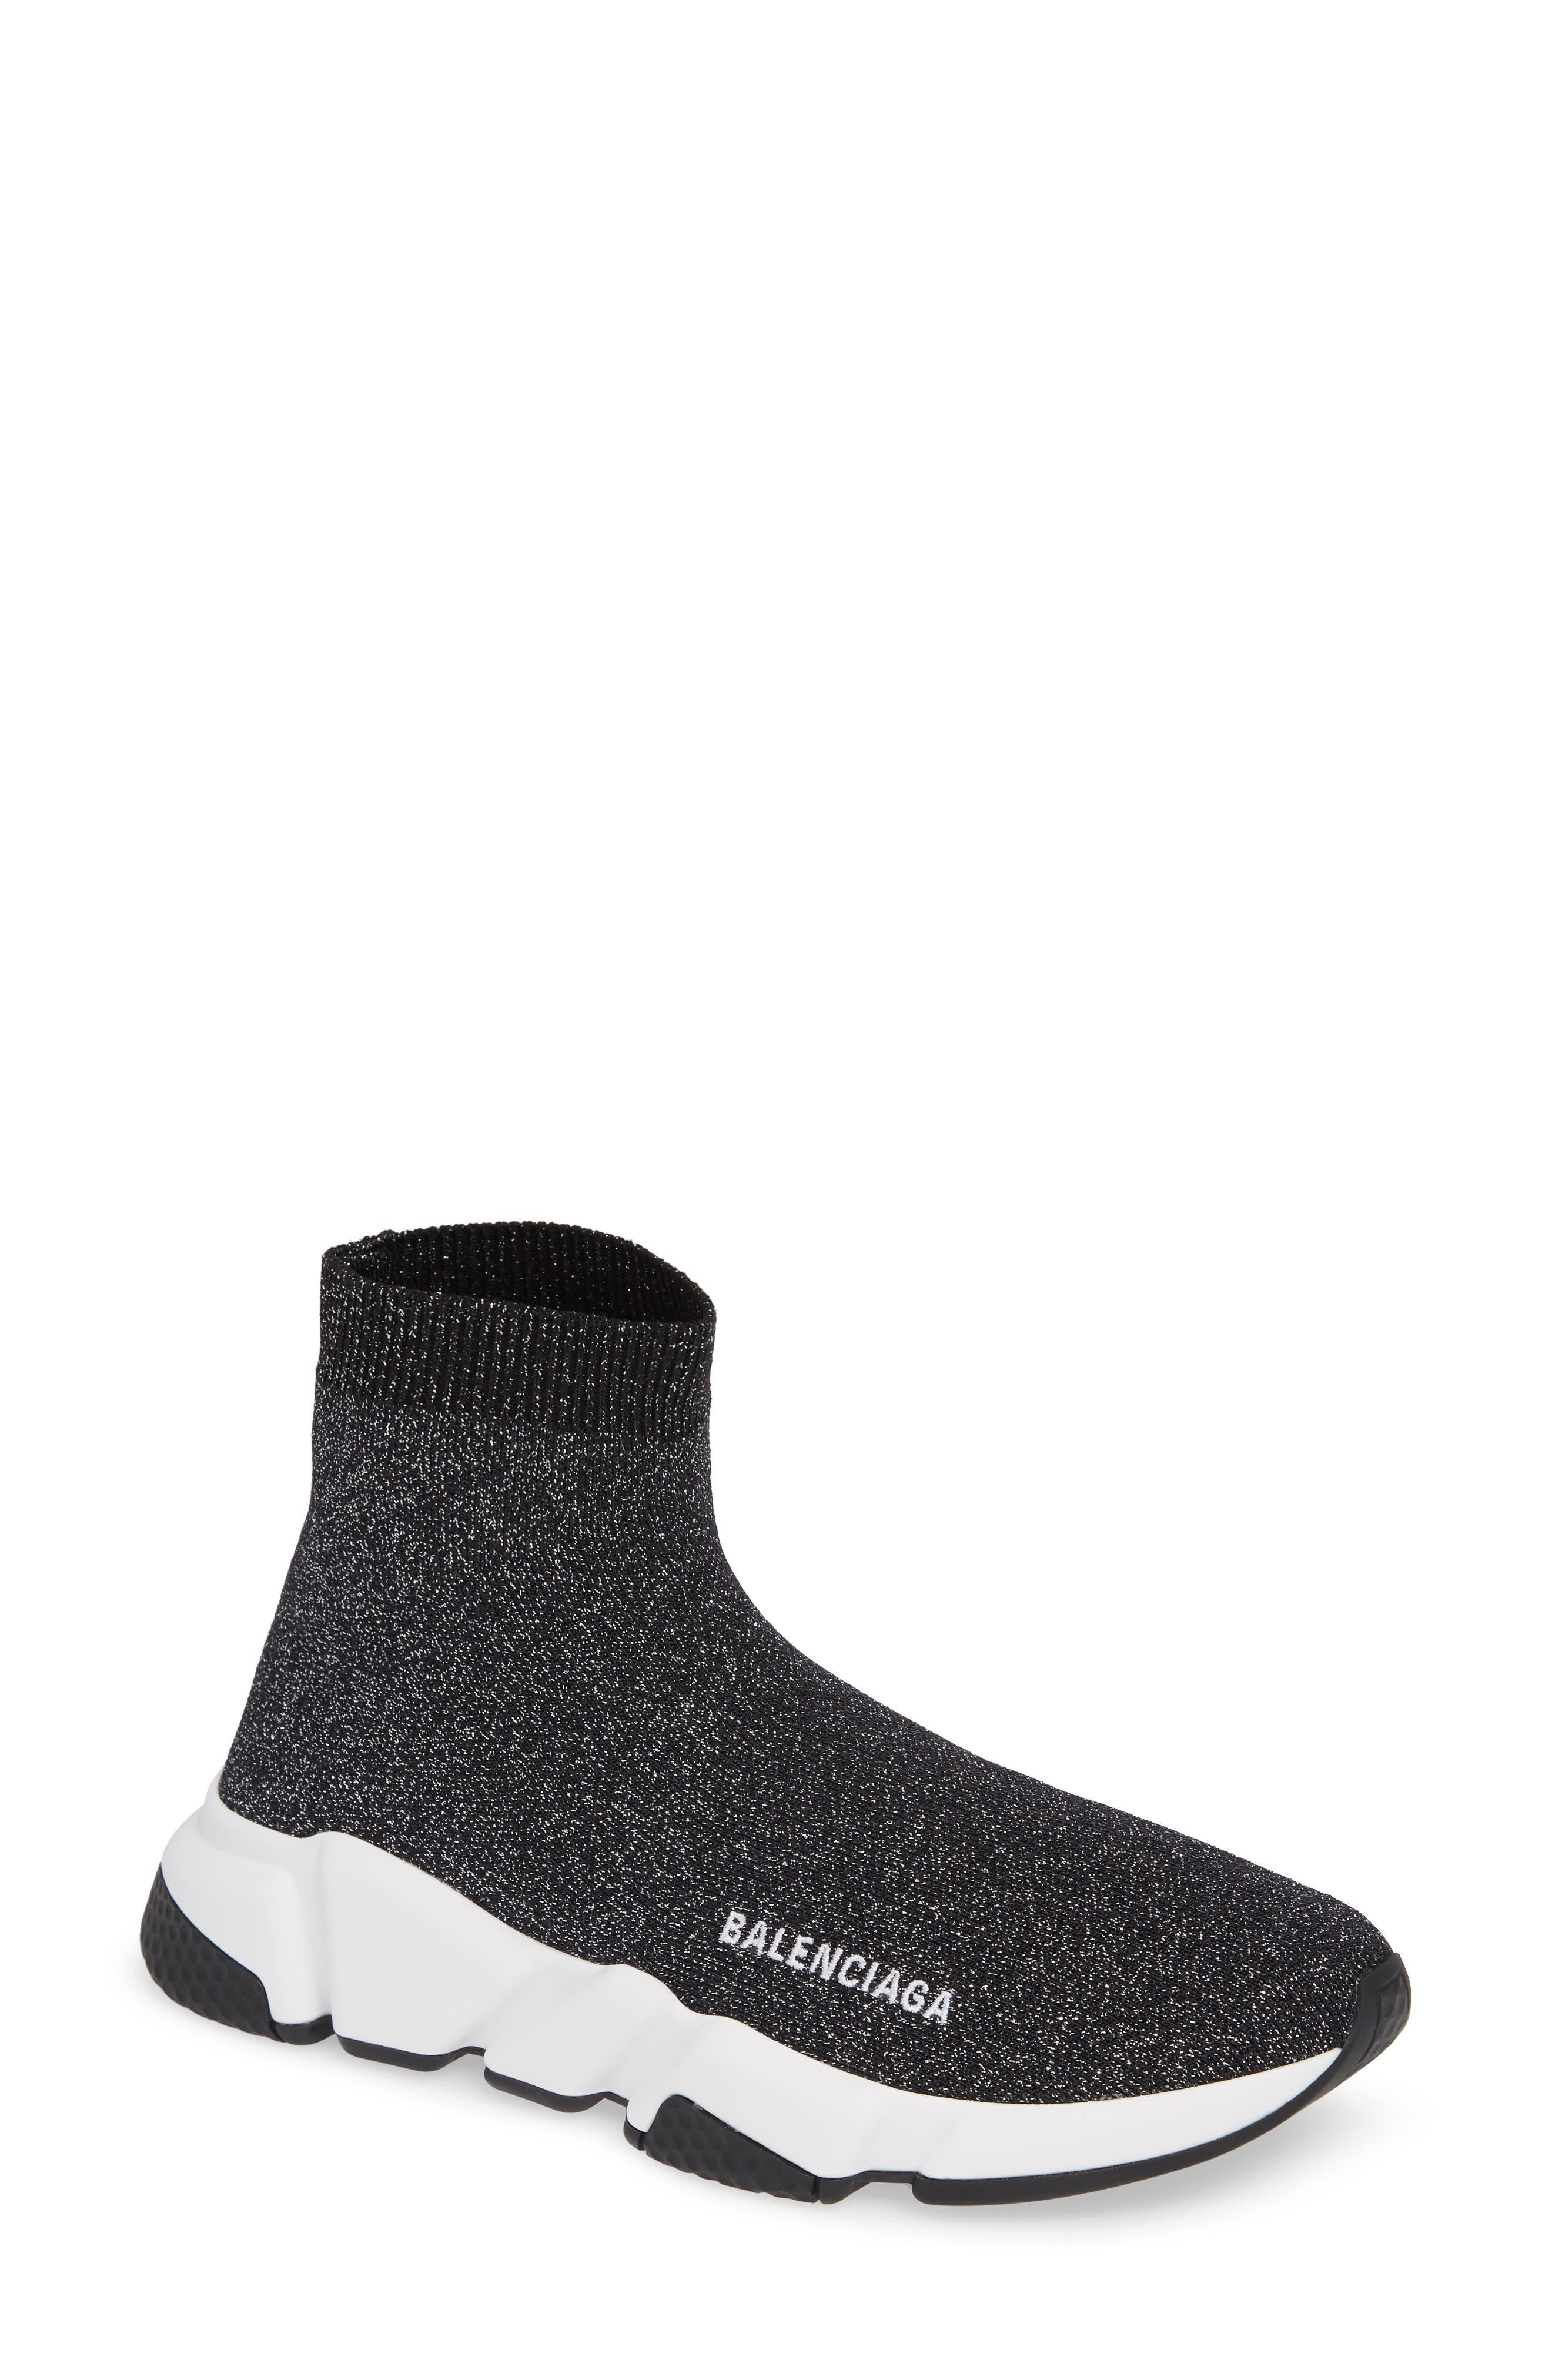 Speed Knit Sneaker,                         Main,                         color, BLACK PEPPER